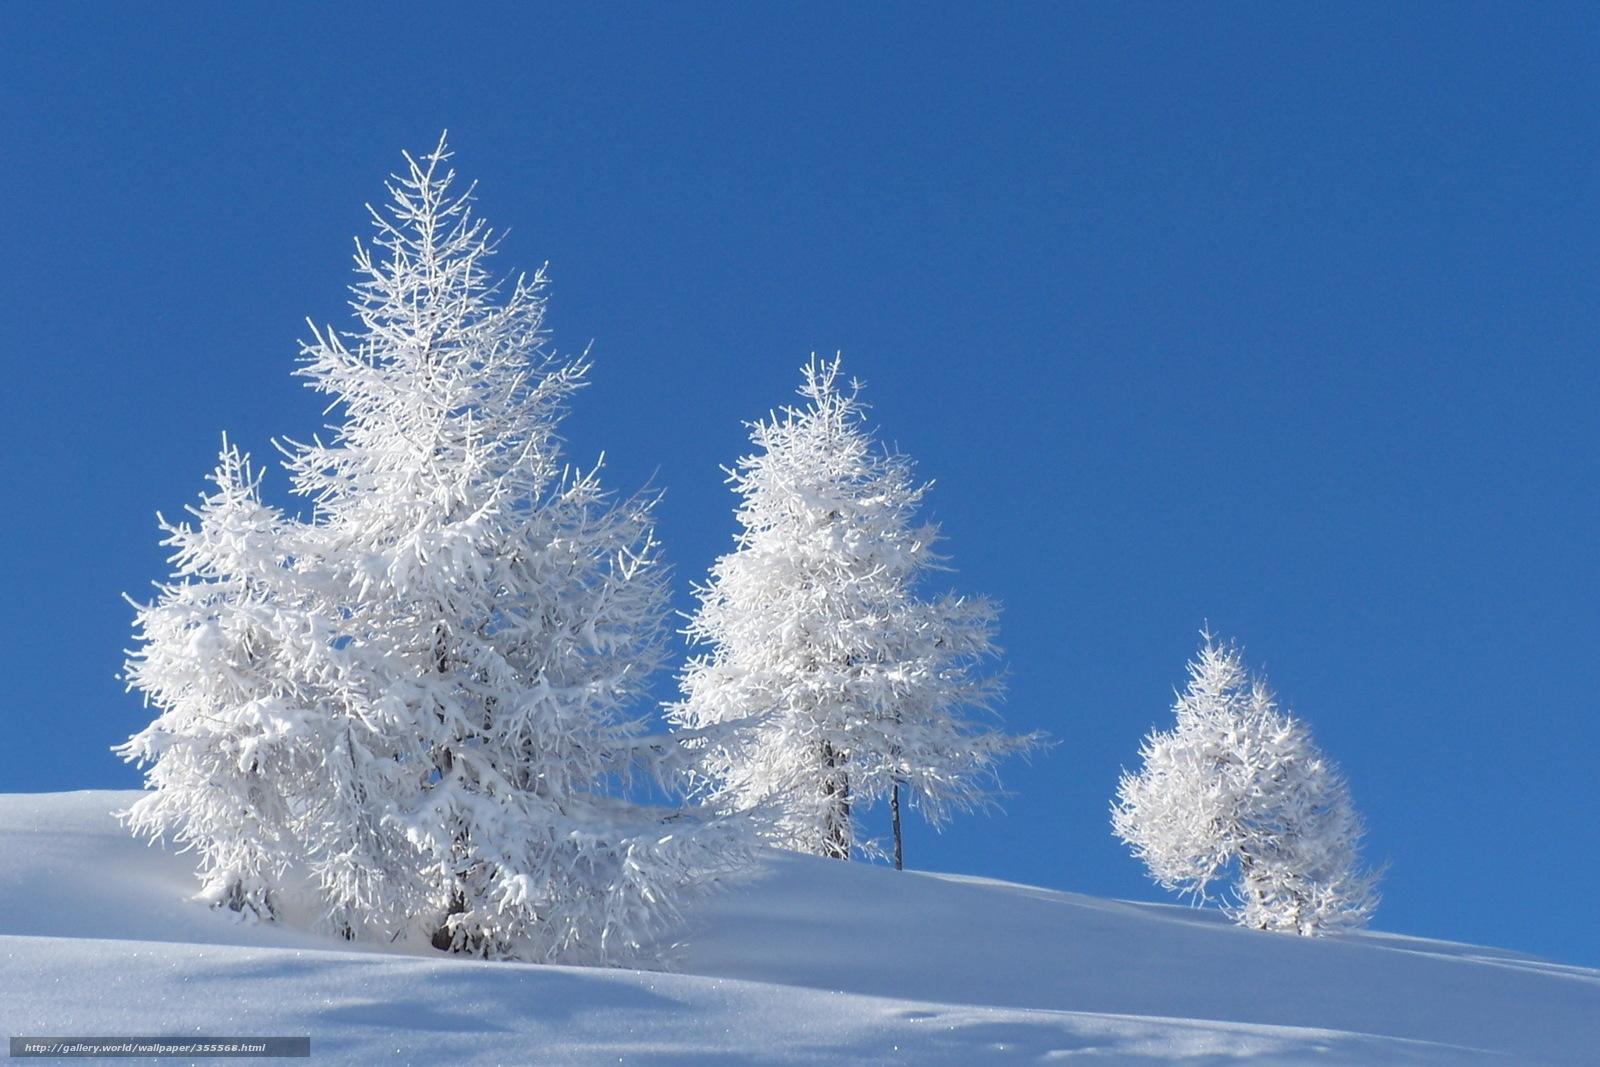 Scaricare gli sfondi inverno neve alberi natura sfondi for Sfondi gratis desktop inverno